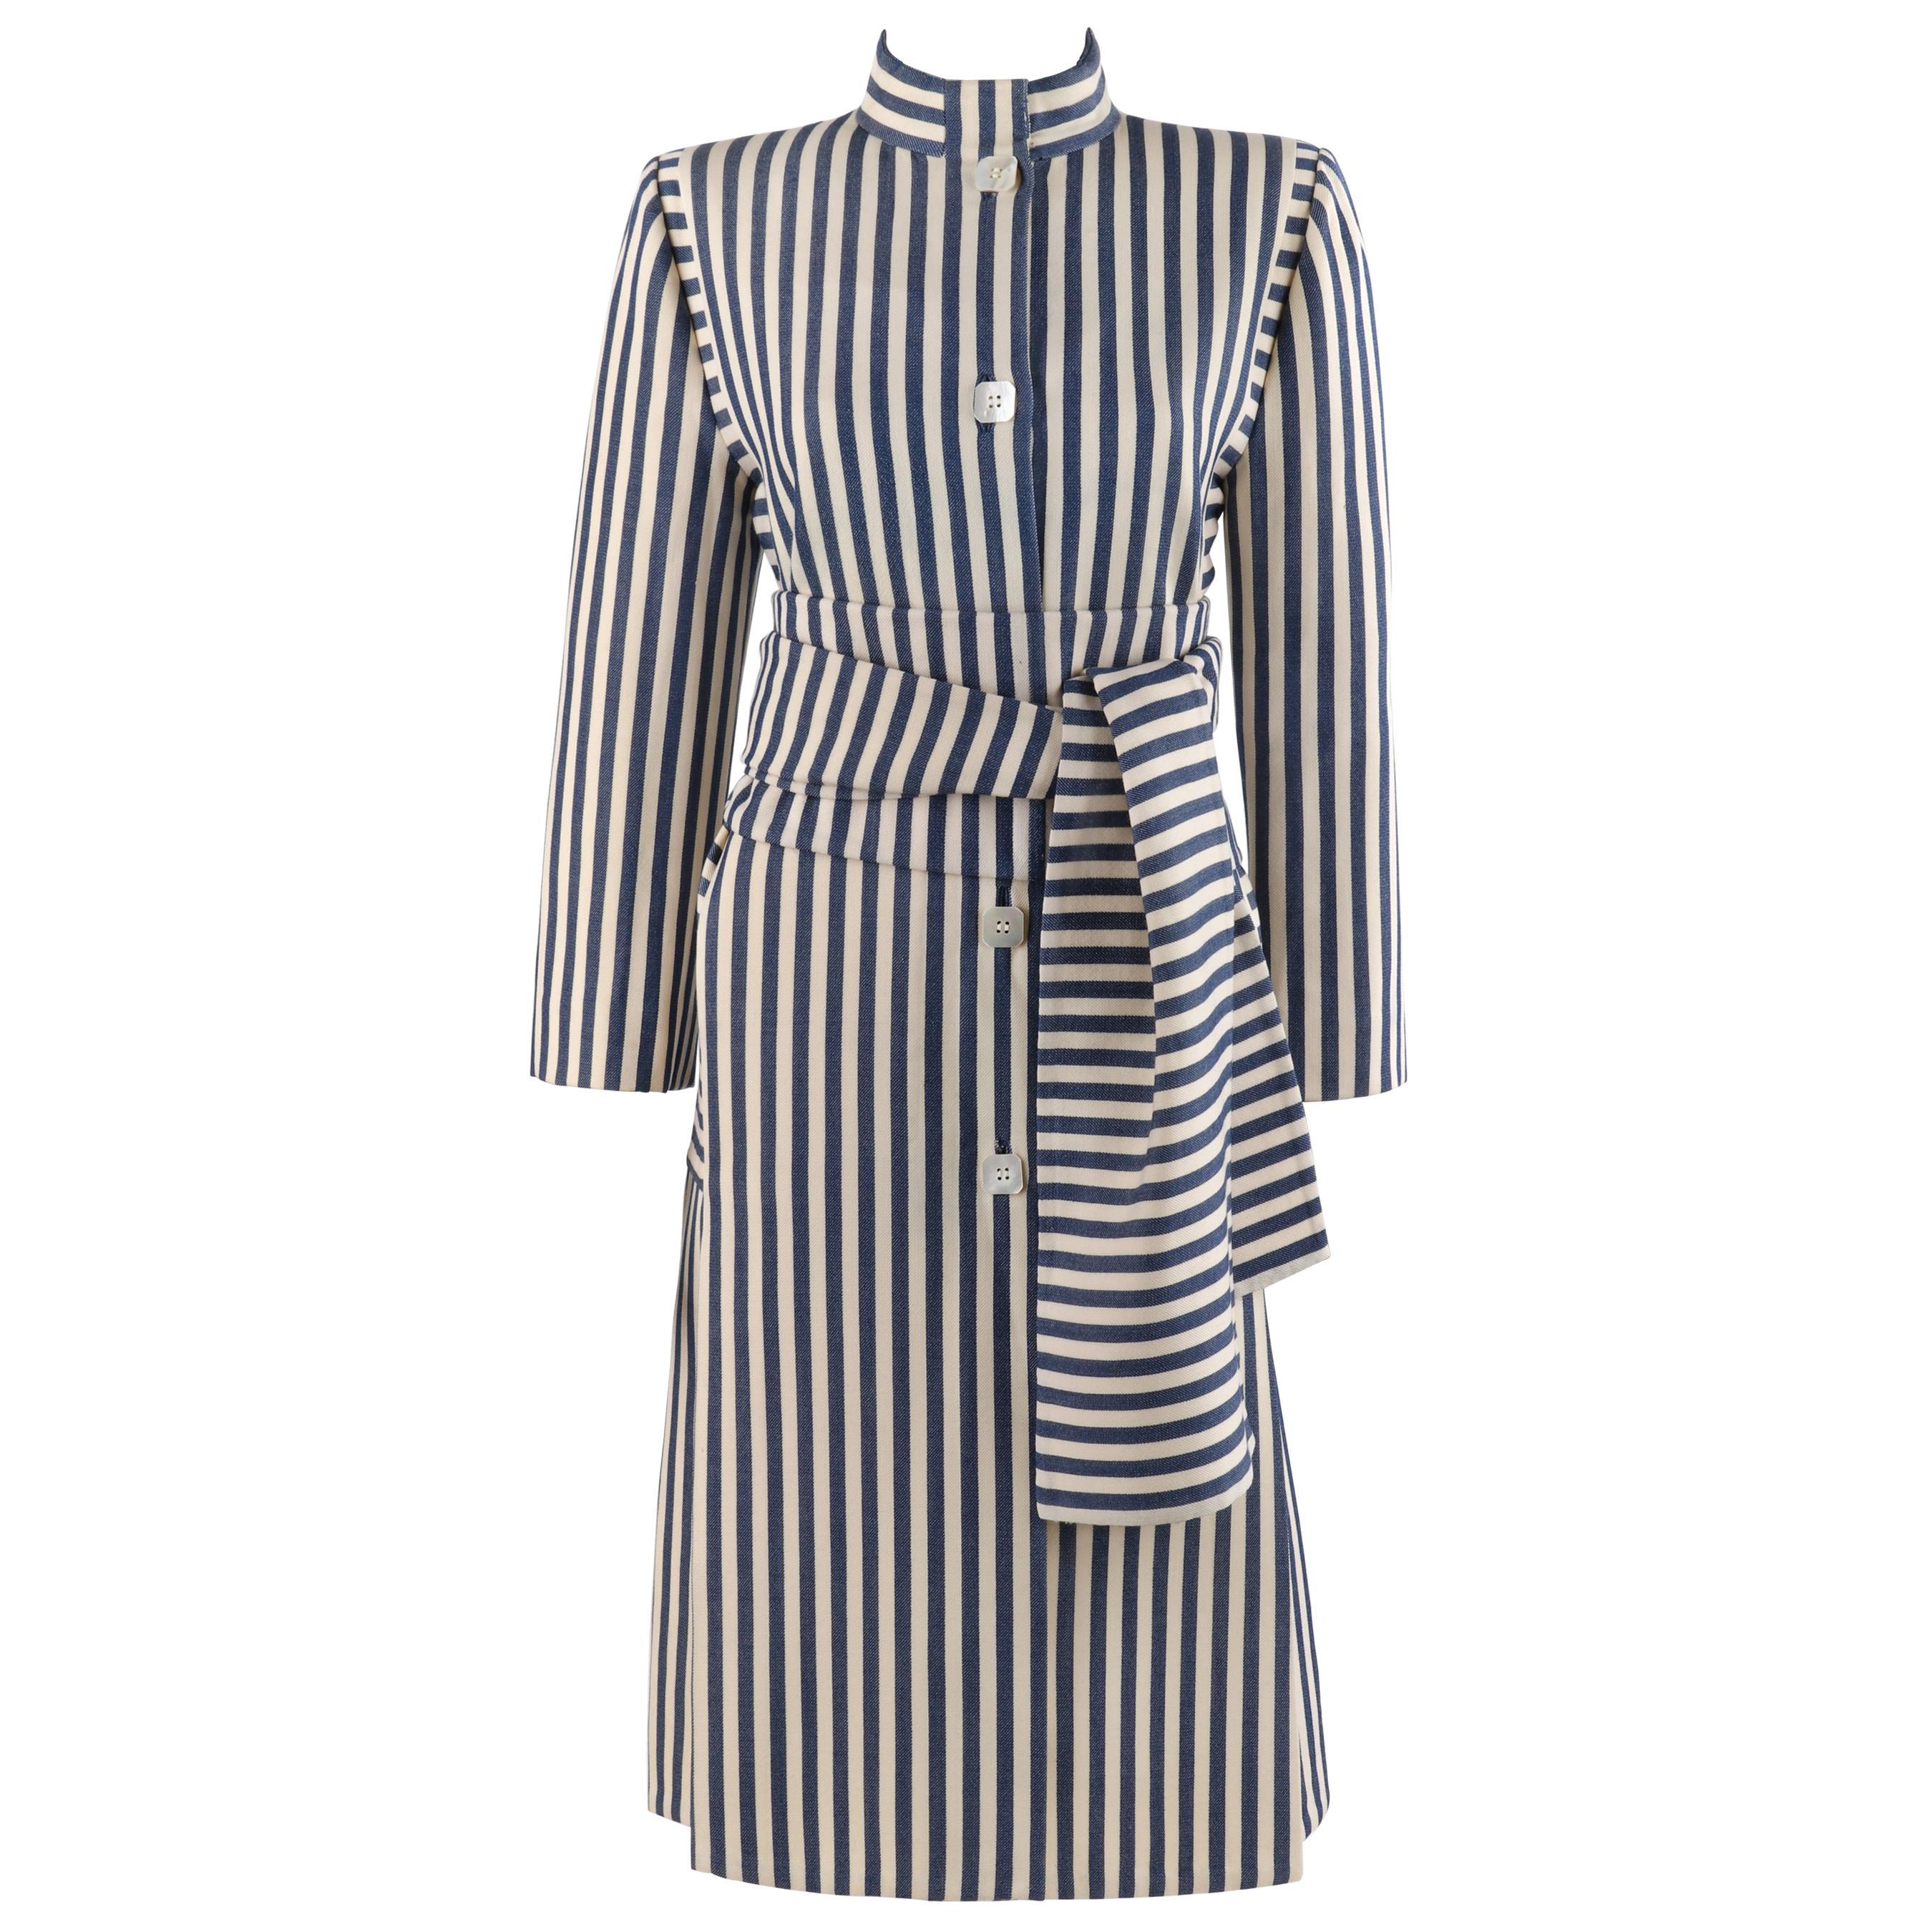 PAULINE TRIGERE c.1980's Blue Ivory Striped Pleated Coat Jacket Sash Scarf Set